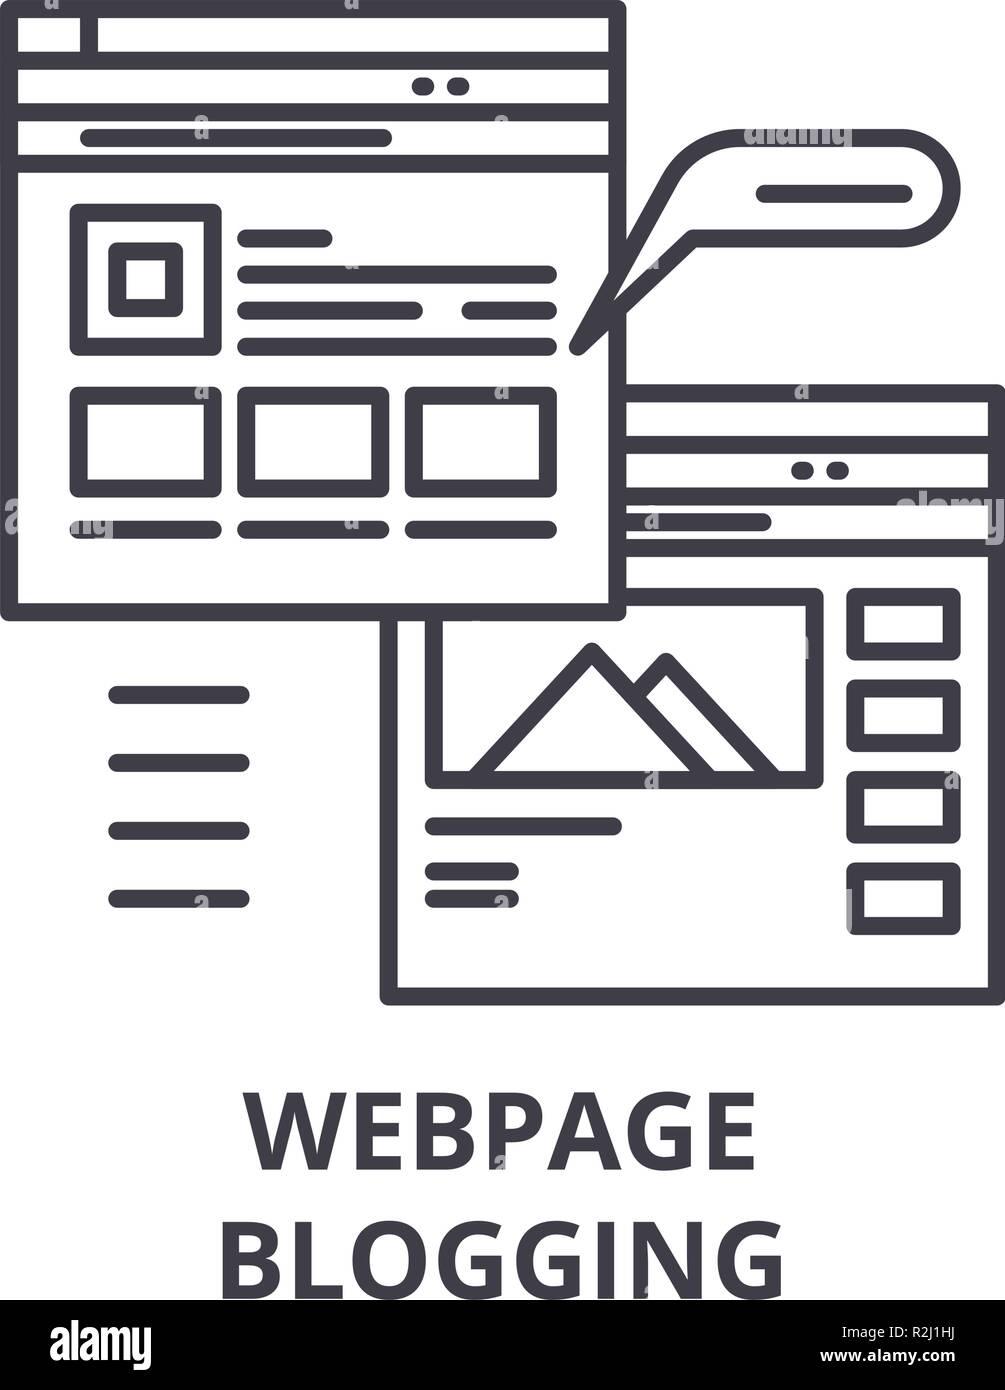 Webpage blogging line icon concept. Webpage blogging vector linear illustration, symbol, sign - Stock Image